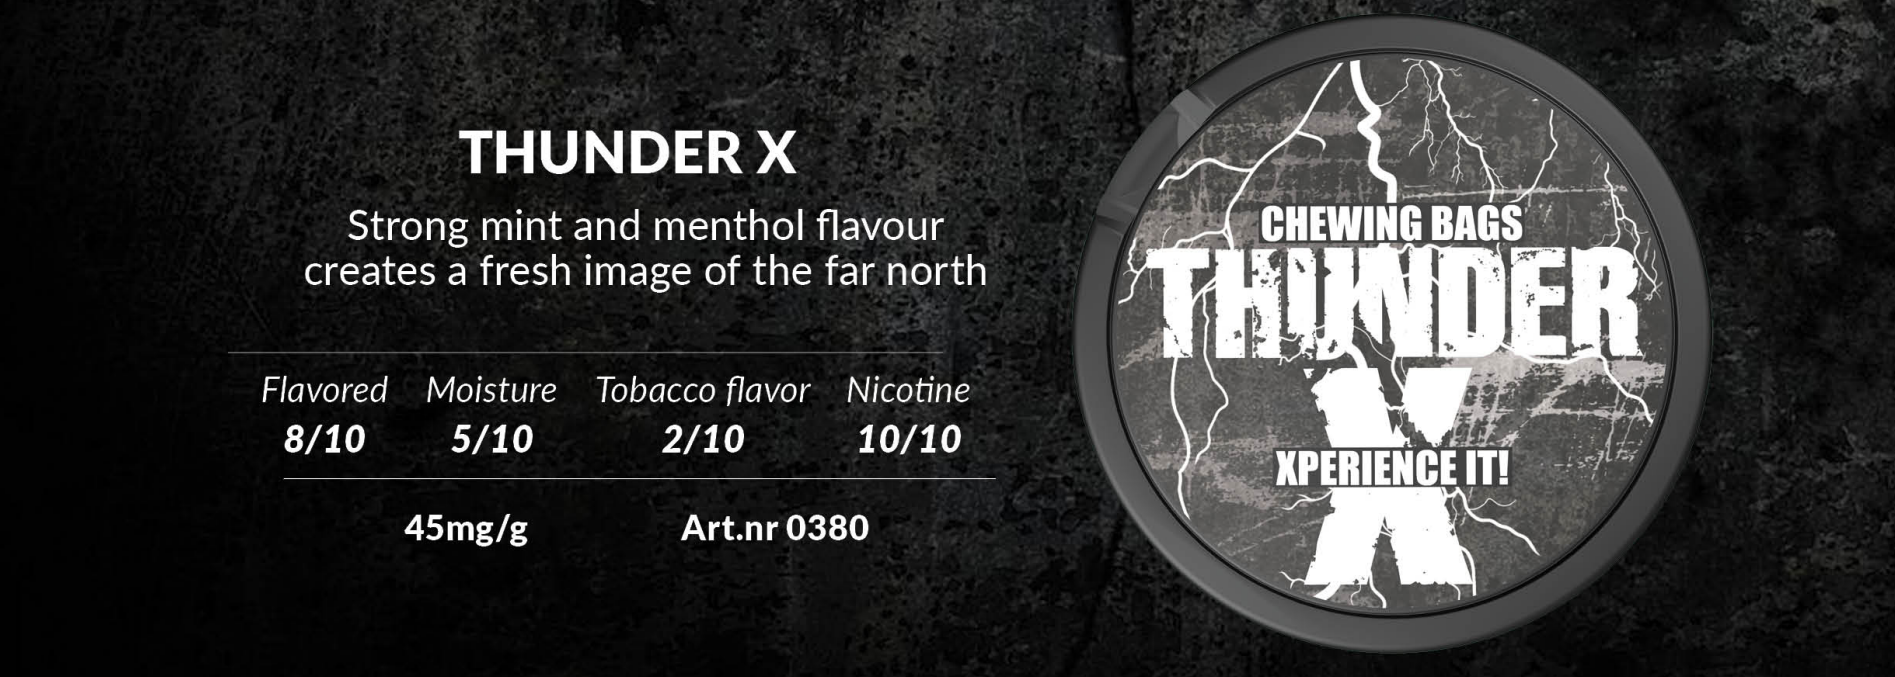 Thunder X Xperience